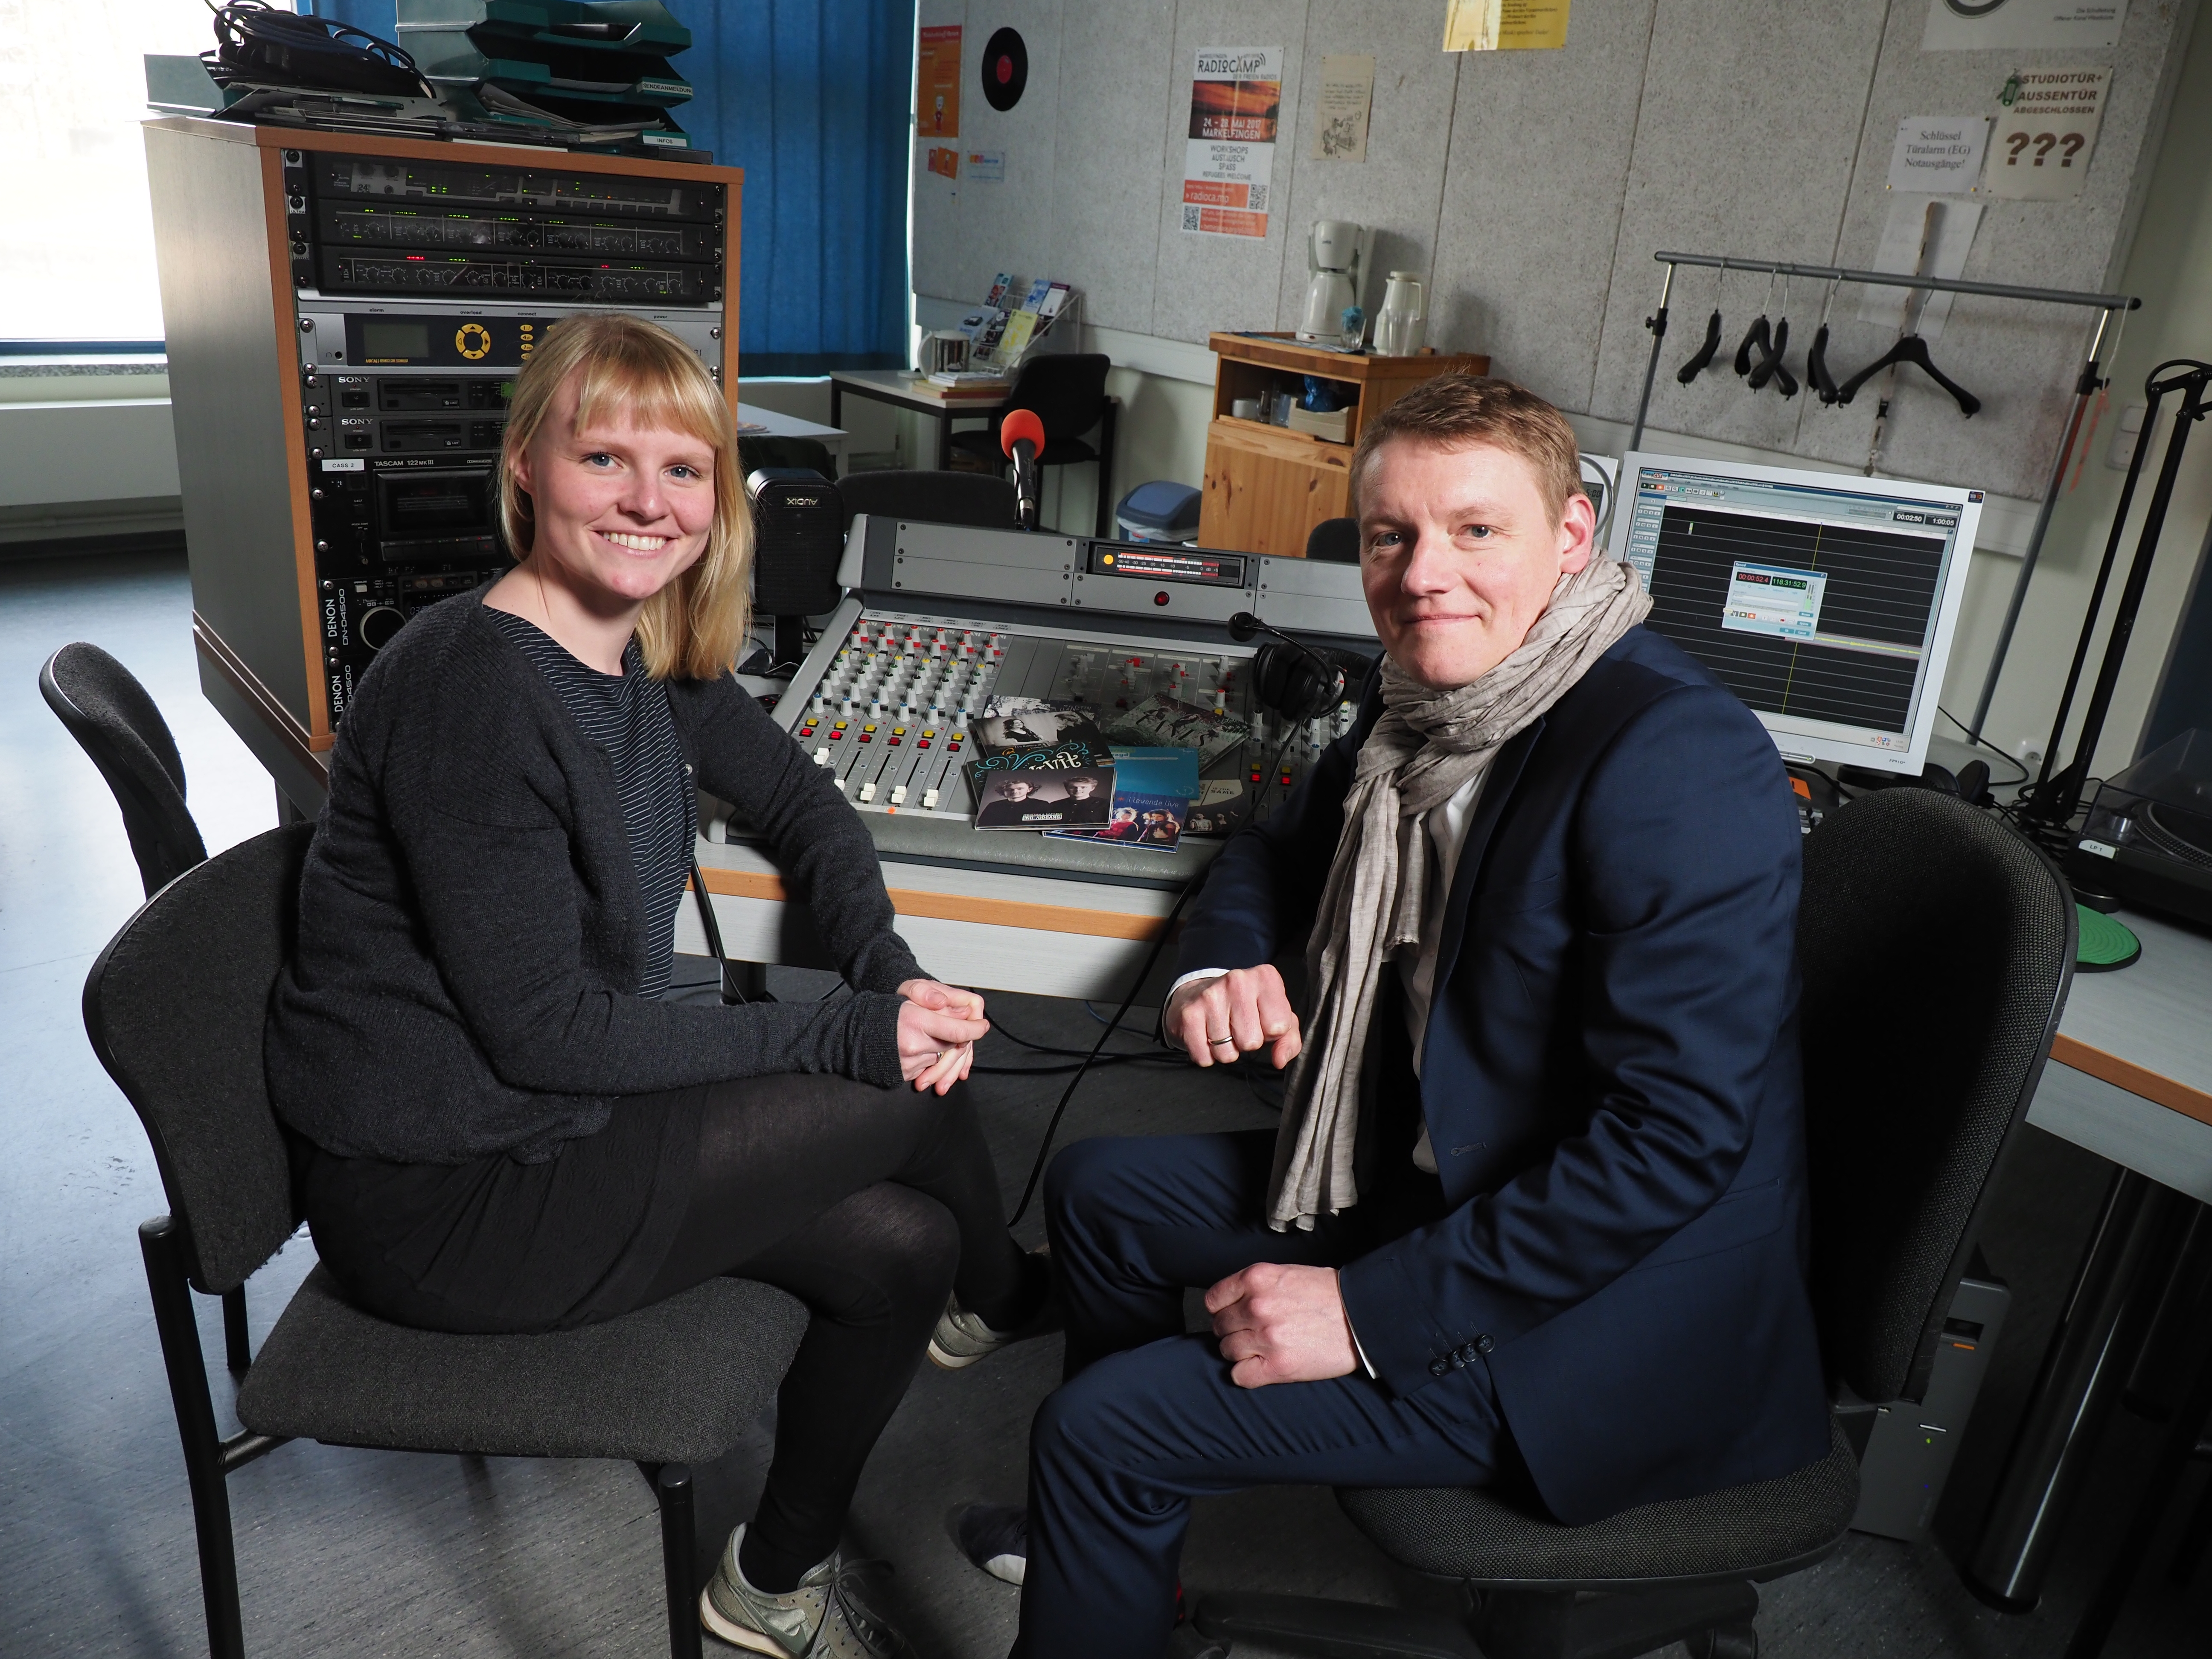 Elsiabeth Kose und Harald Haugaard im OK Studio Husum